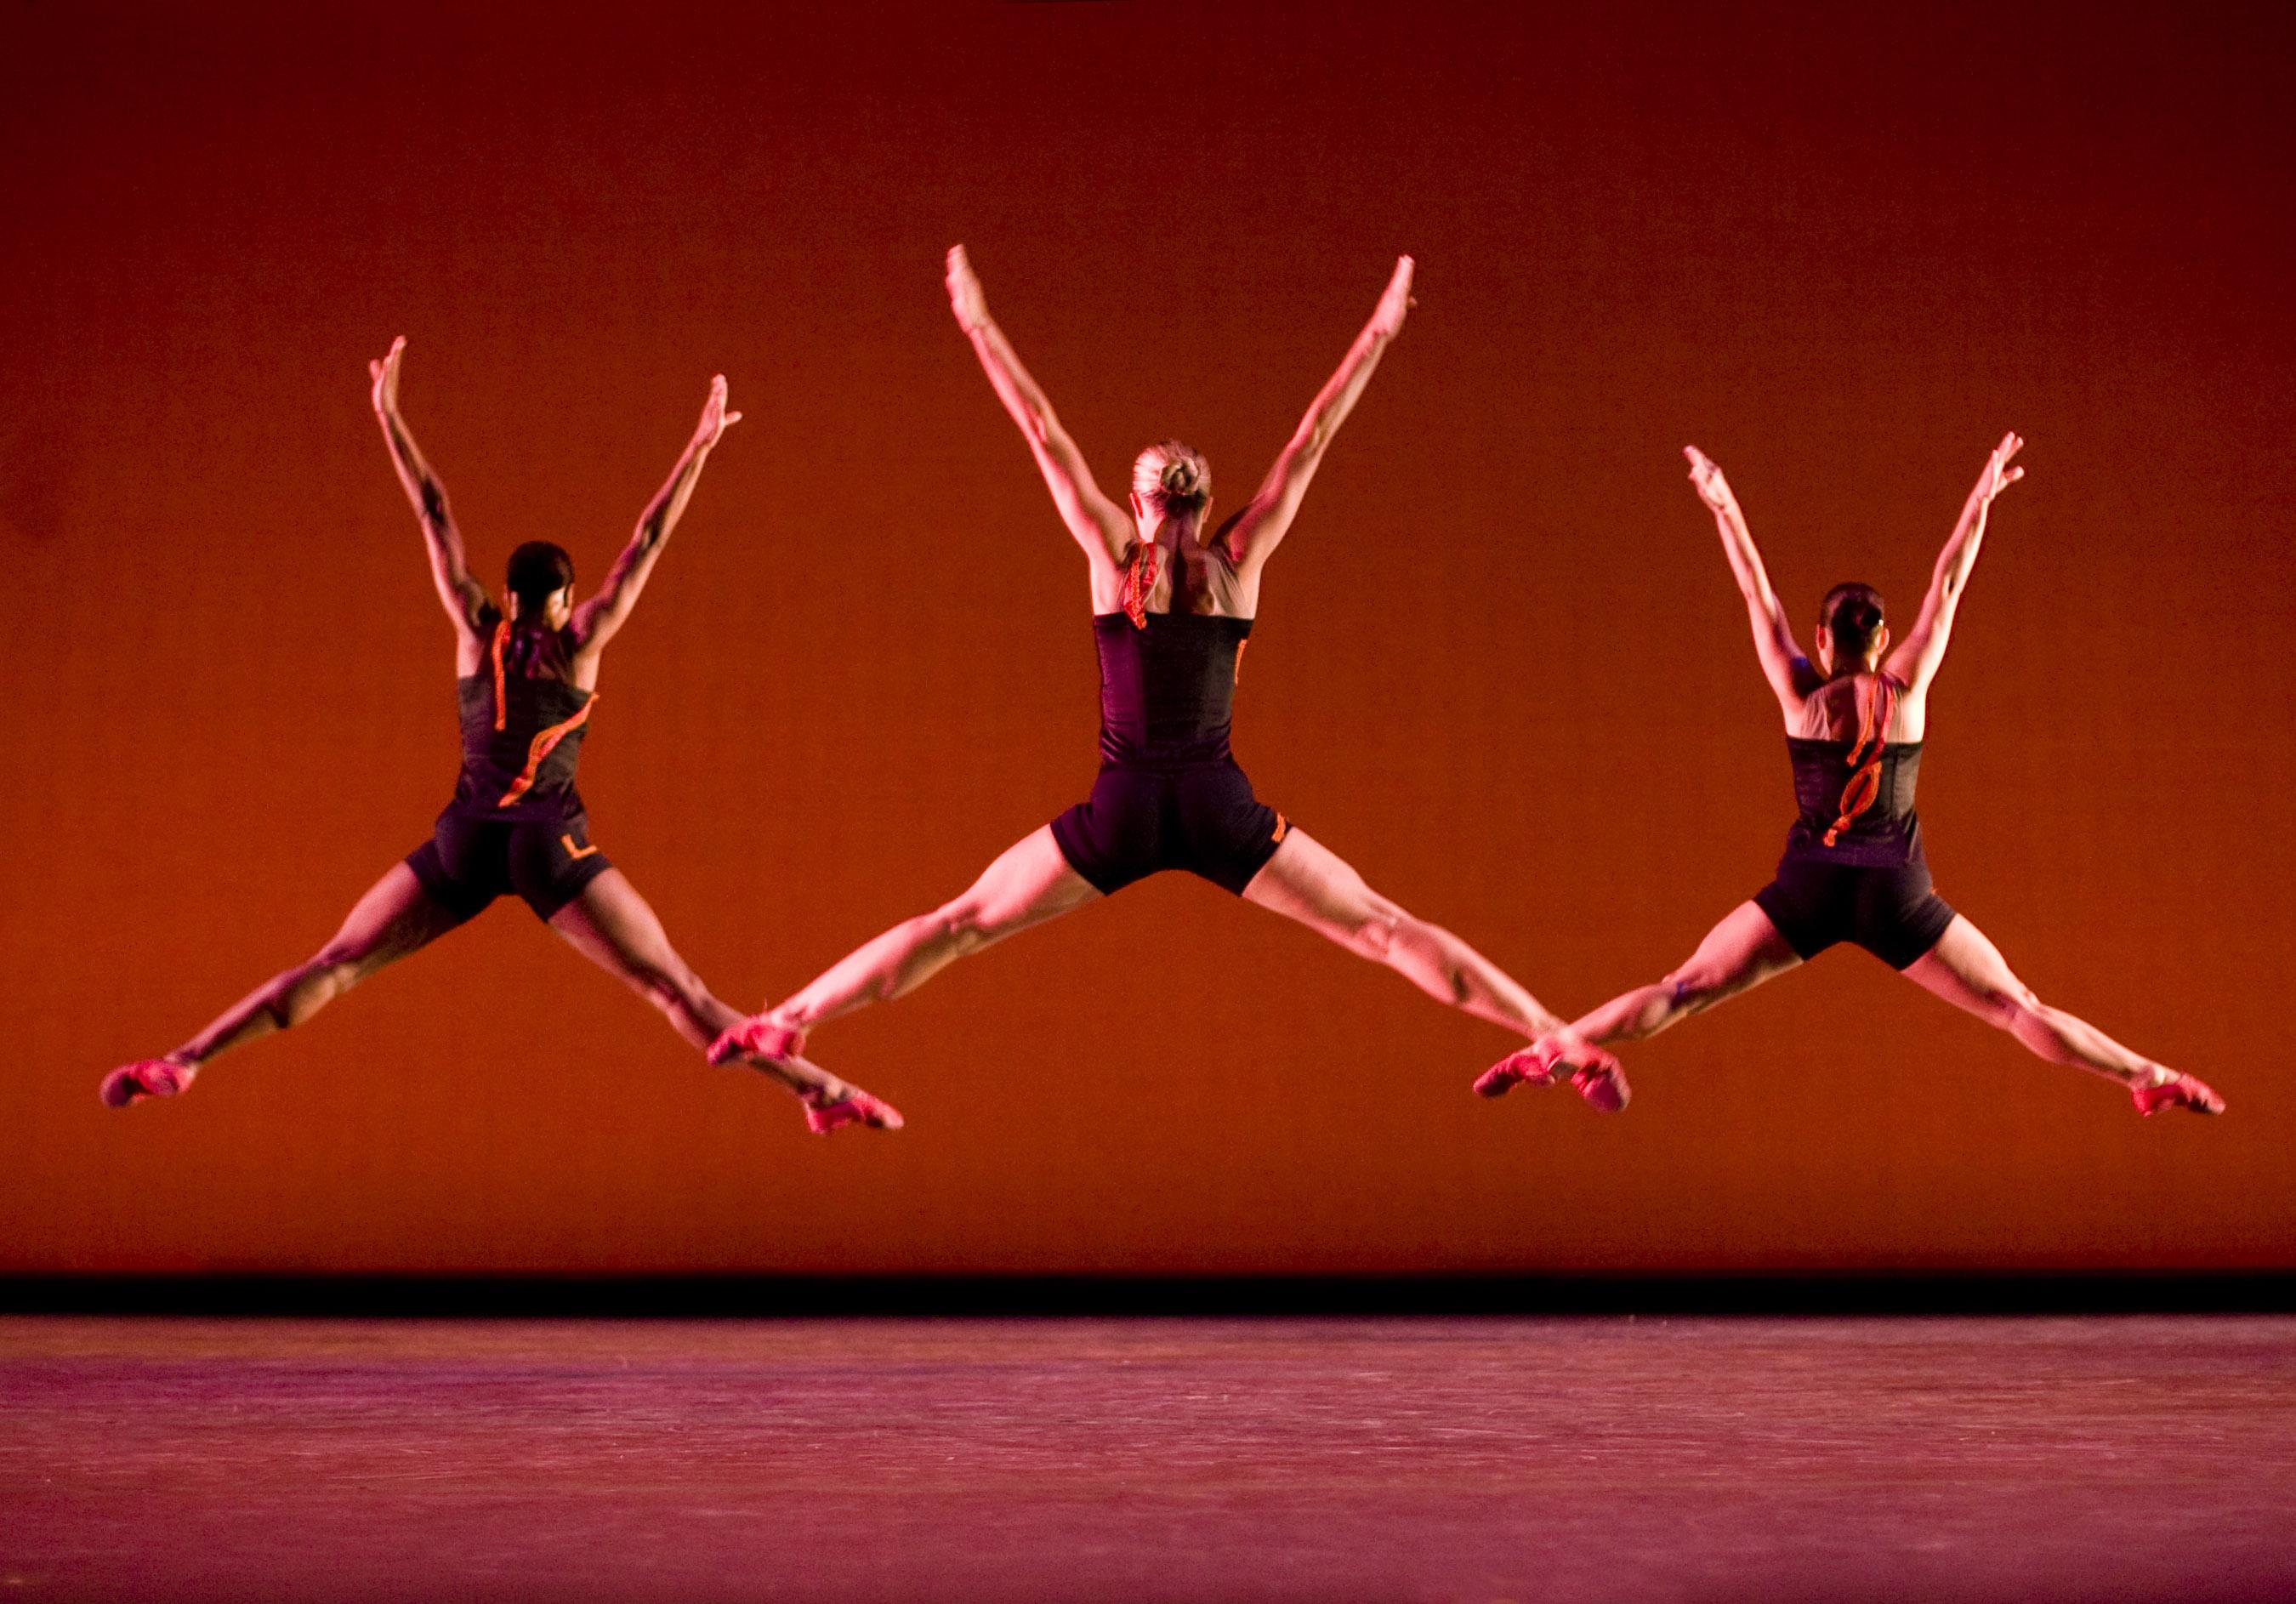 GJDC dancers Ashley Lauren Smith, Meghan McDermott and Lindsey Leduc Brenner. Photo by Cheryl Mann.